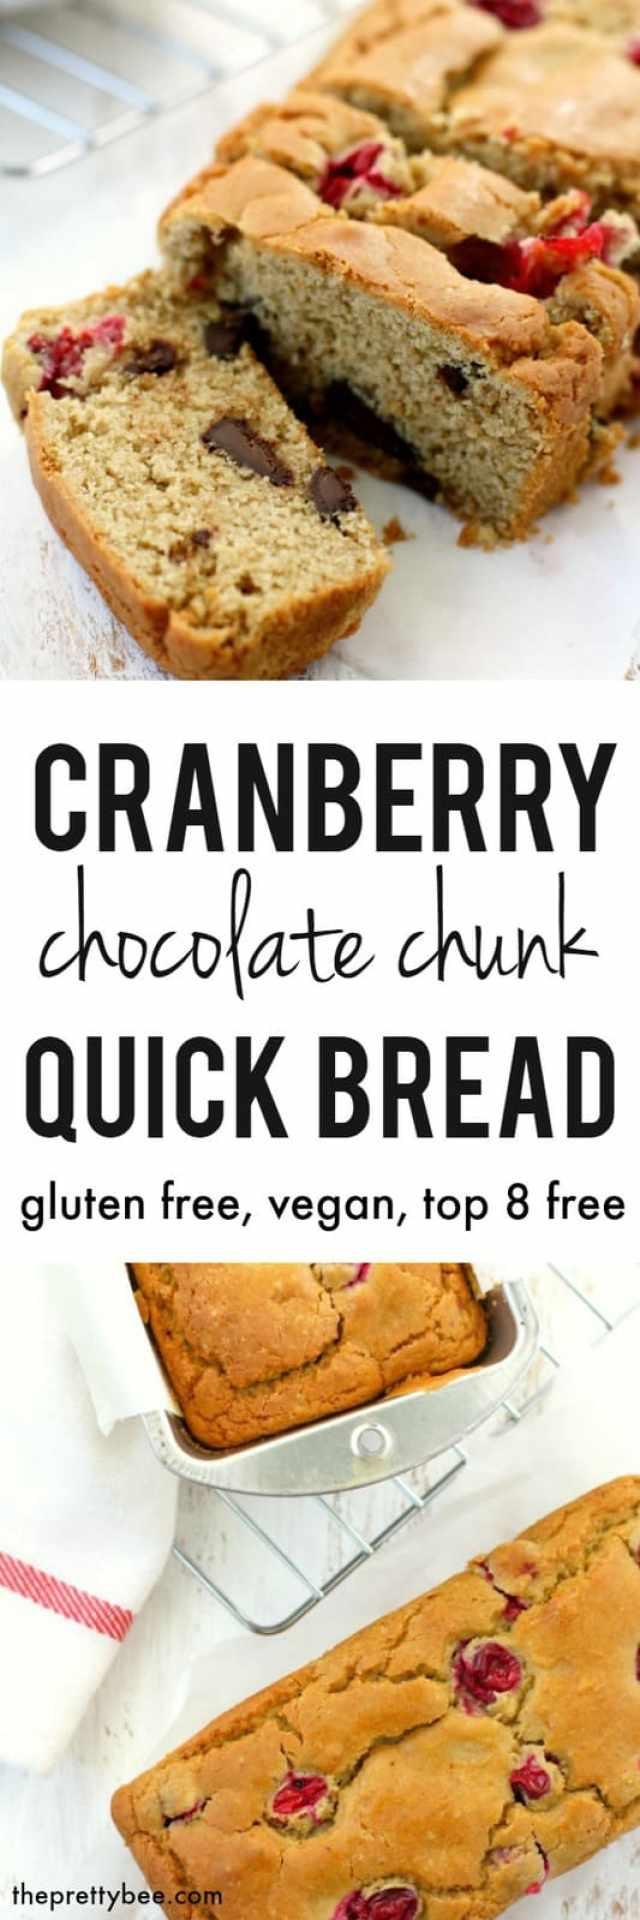 gluten free cranberry chocolate chip quick bread